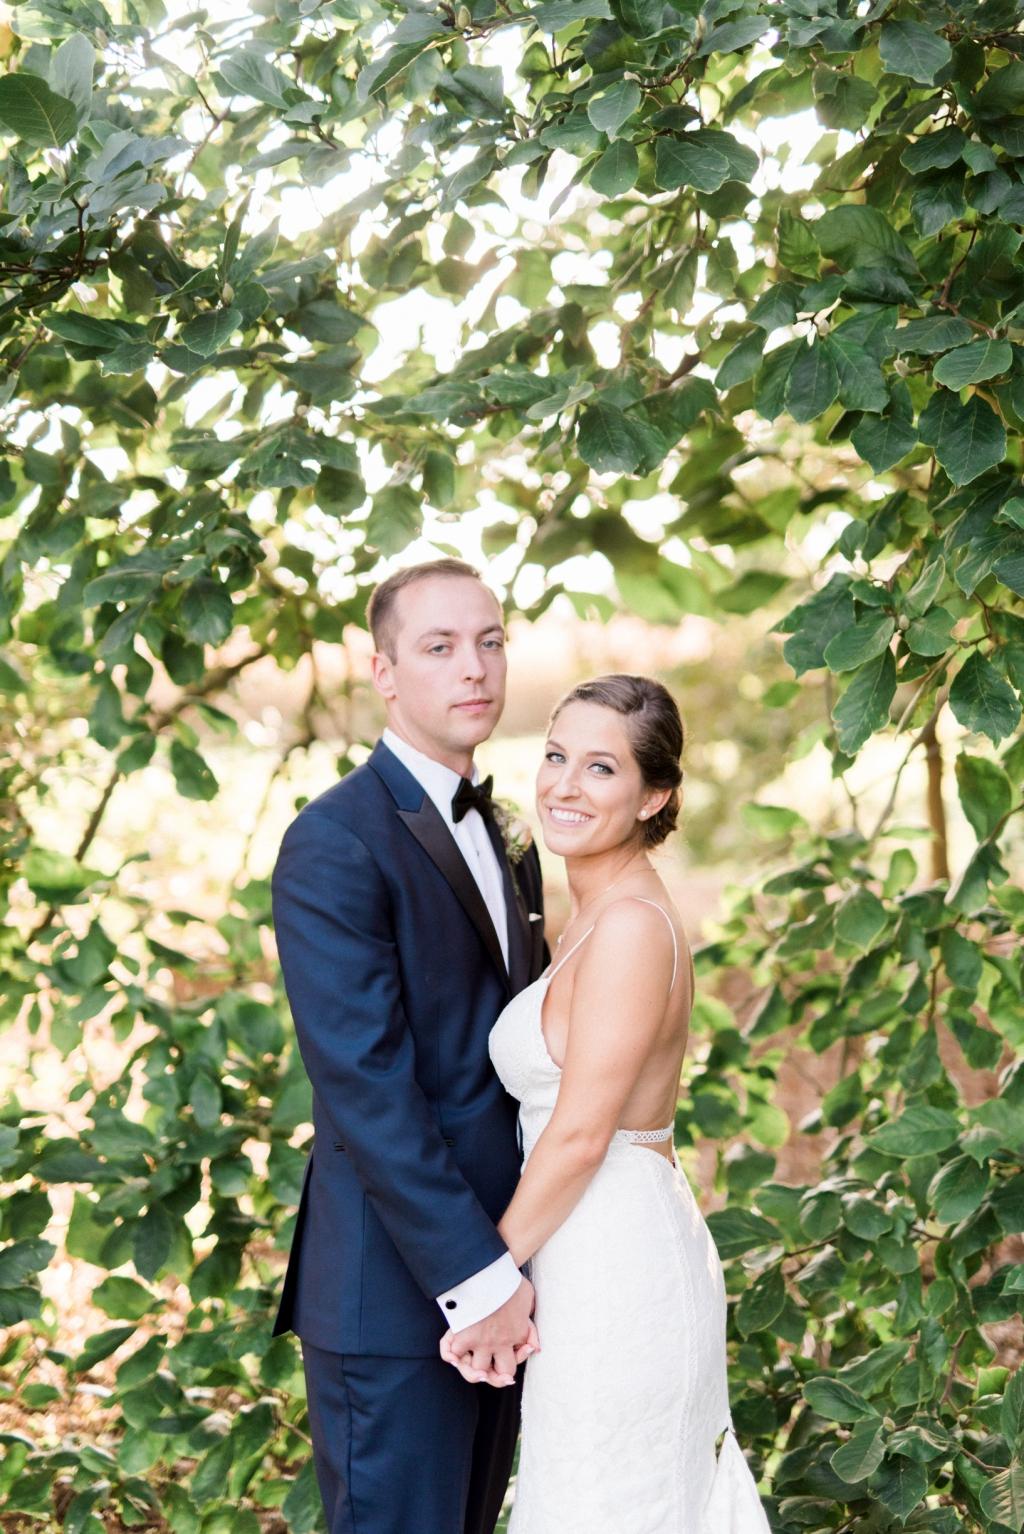 haley-richter-photography-buena-vista-confrence-center-wedding-summer-142